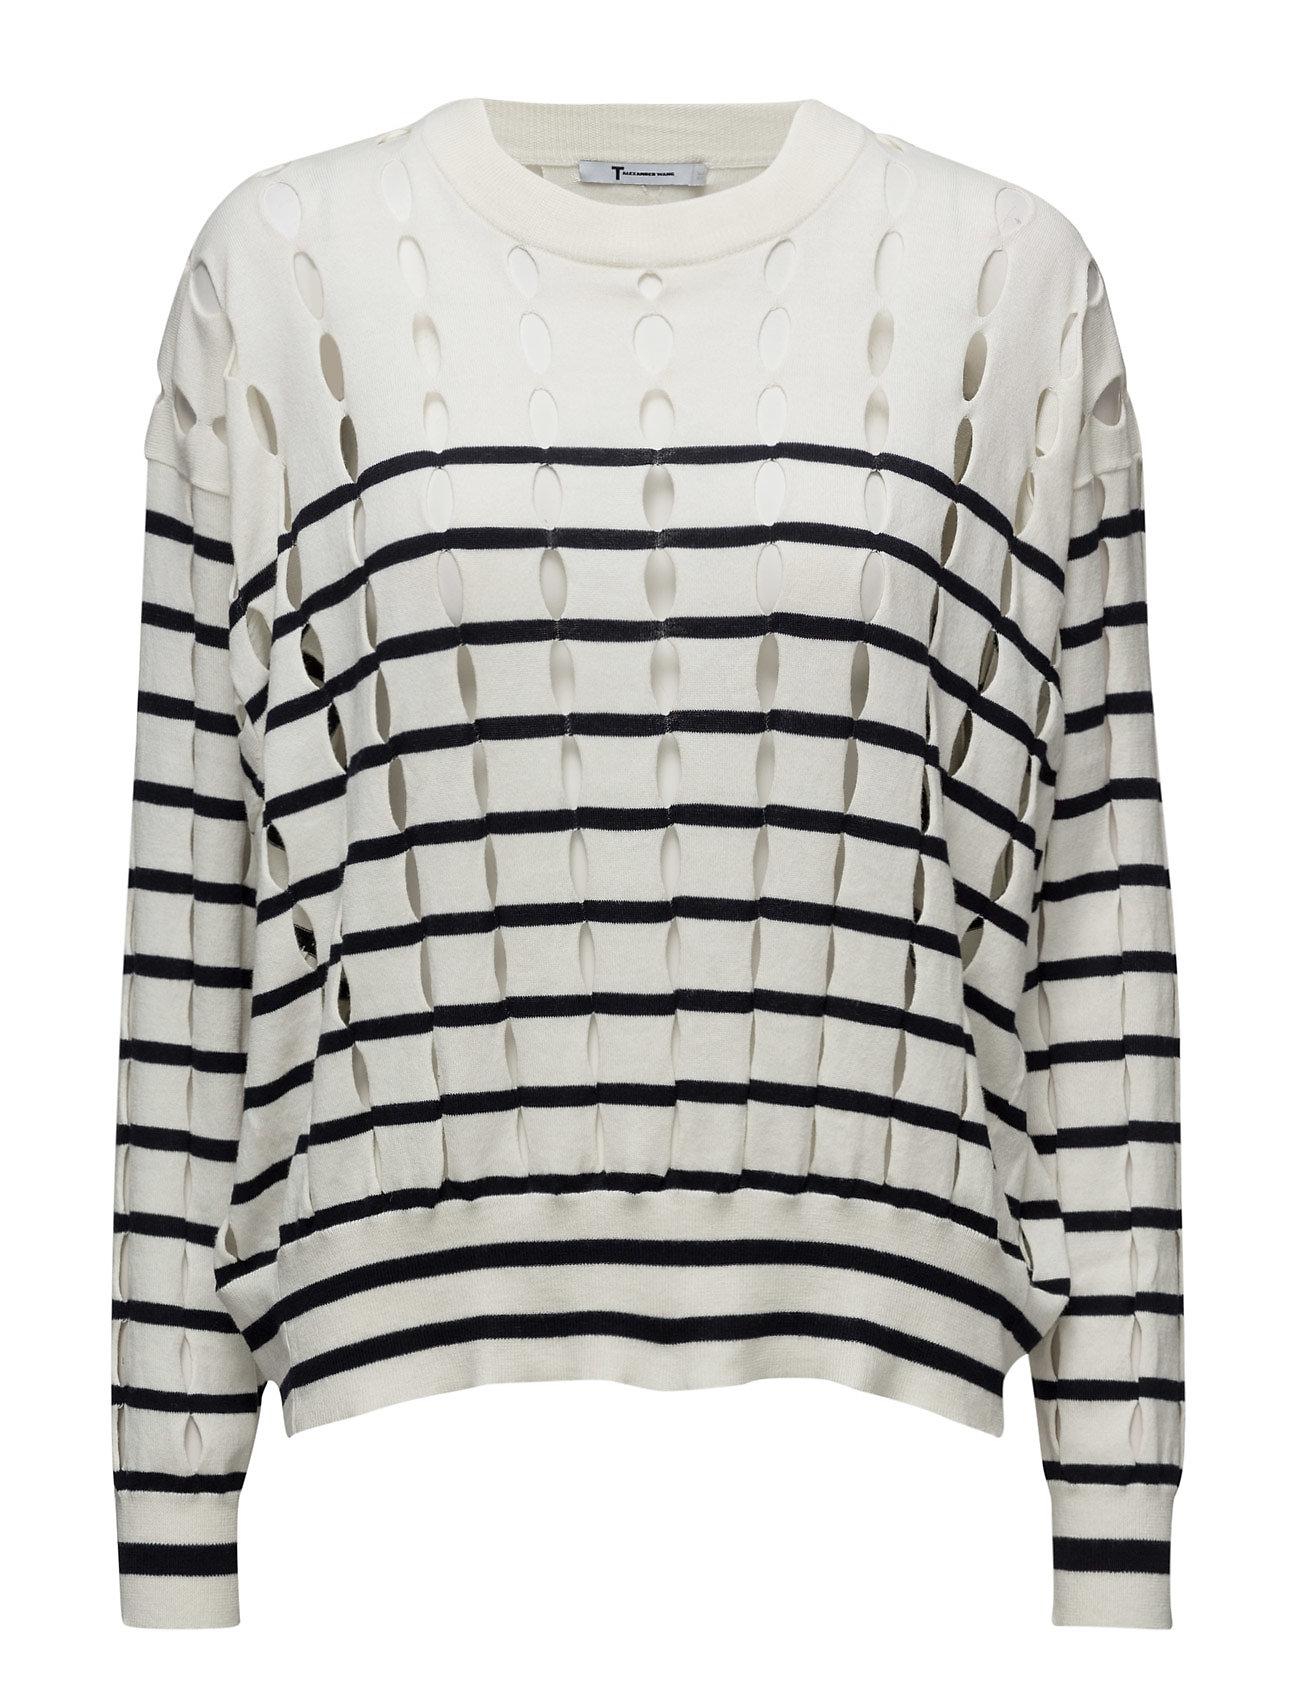 Stripe Cotton Crewneck Pullover With Slits T by Alexander Wang Sweatshirts til Damer i